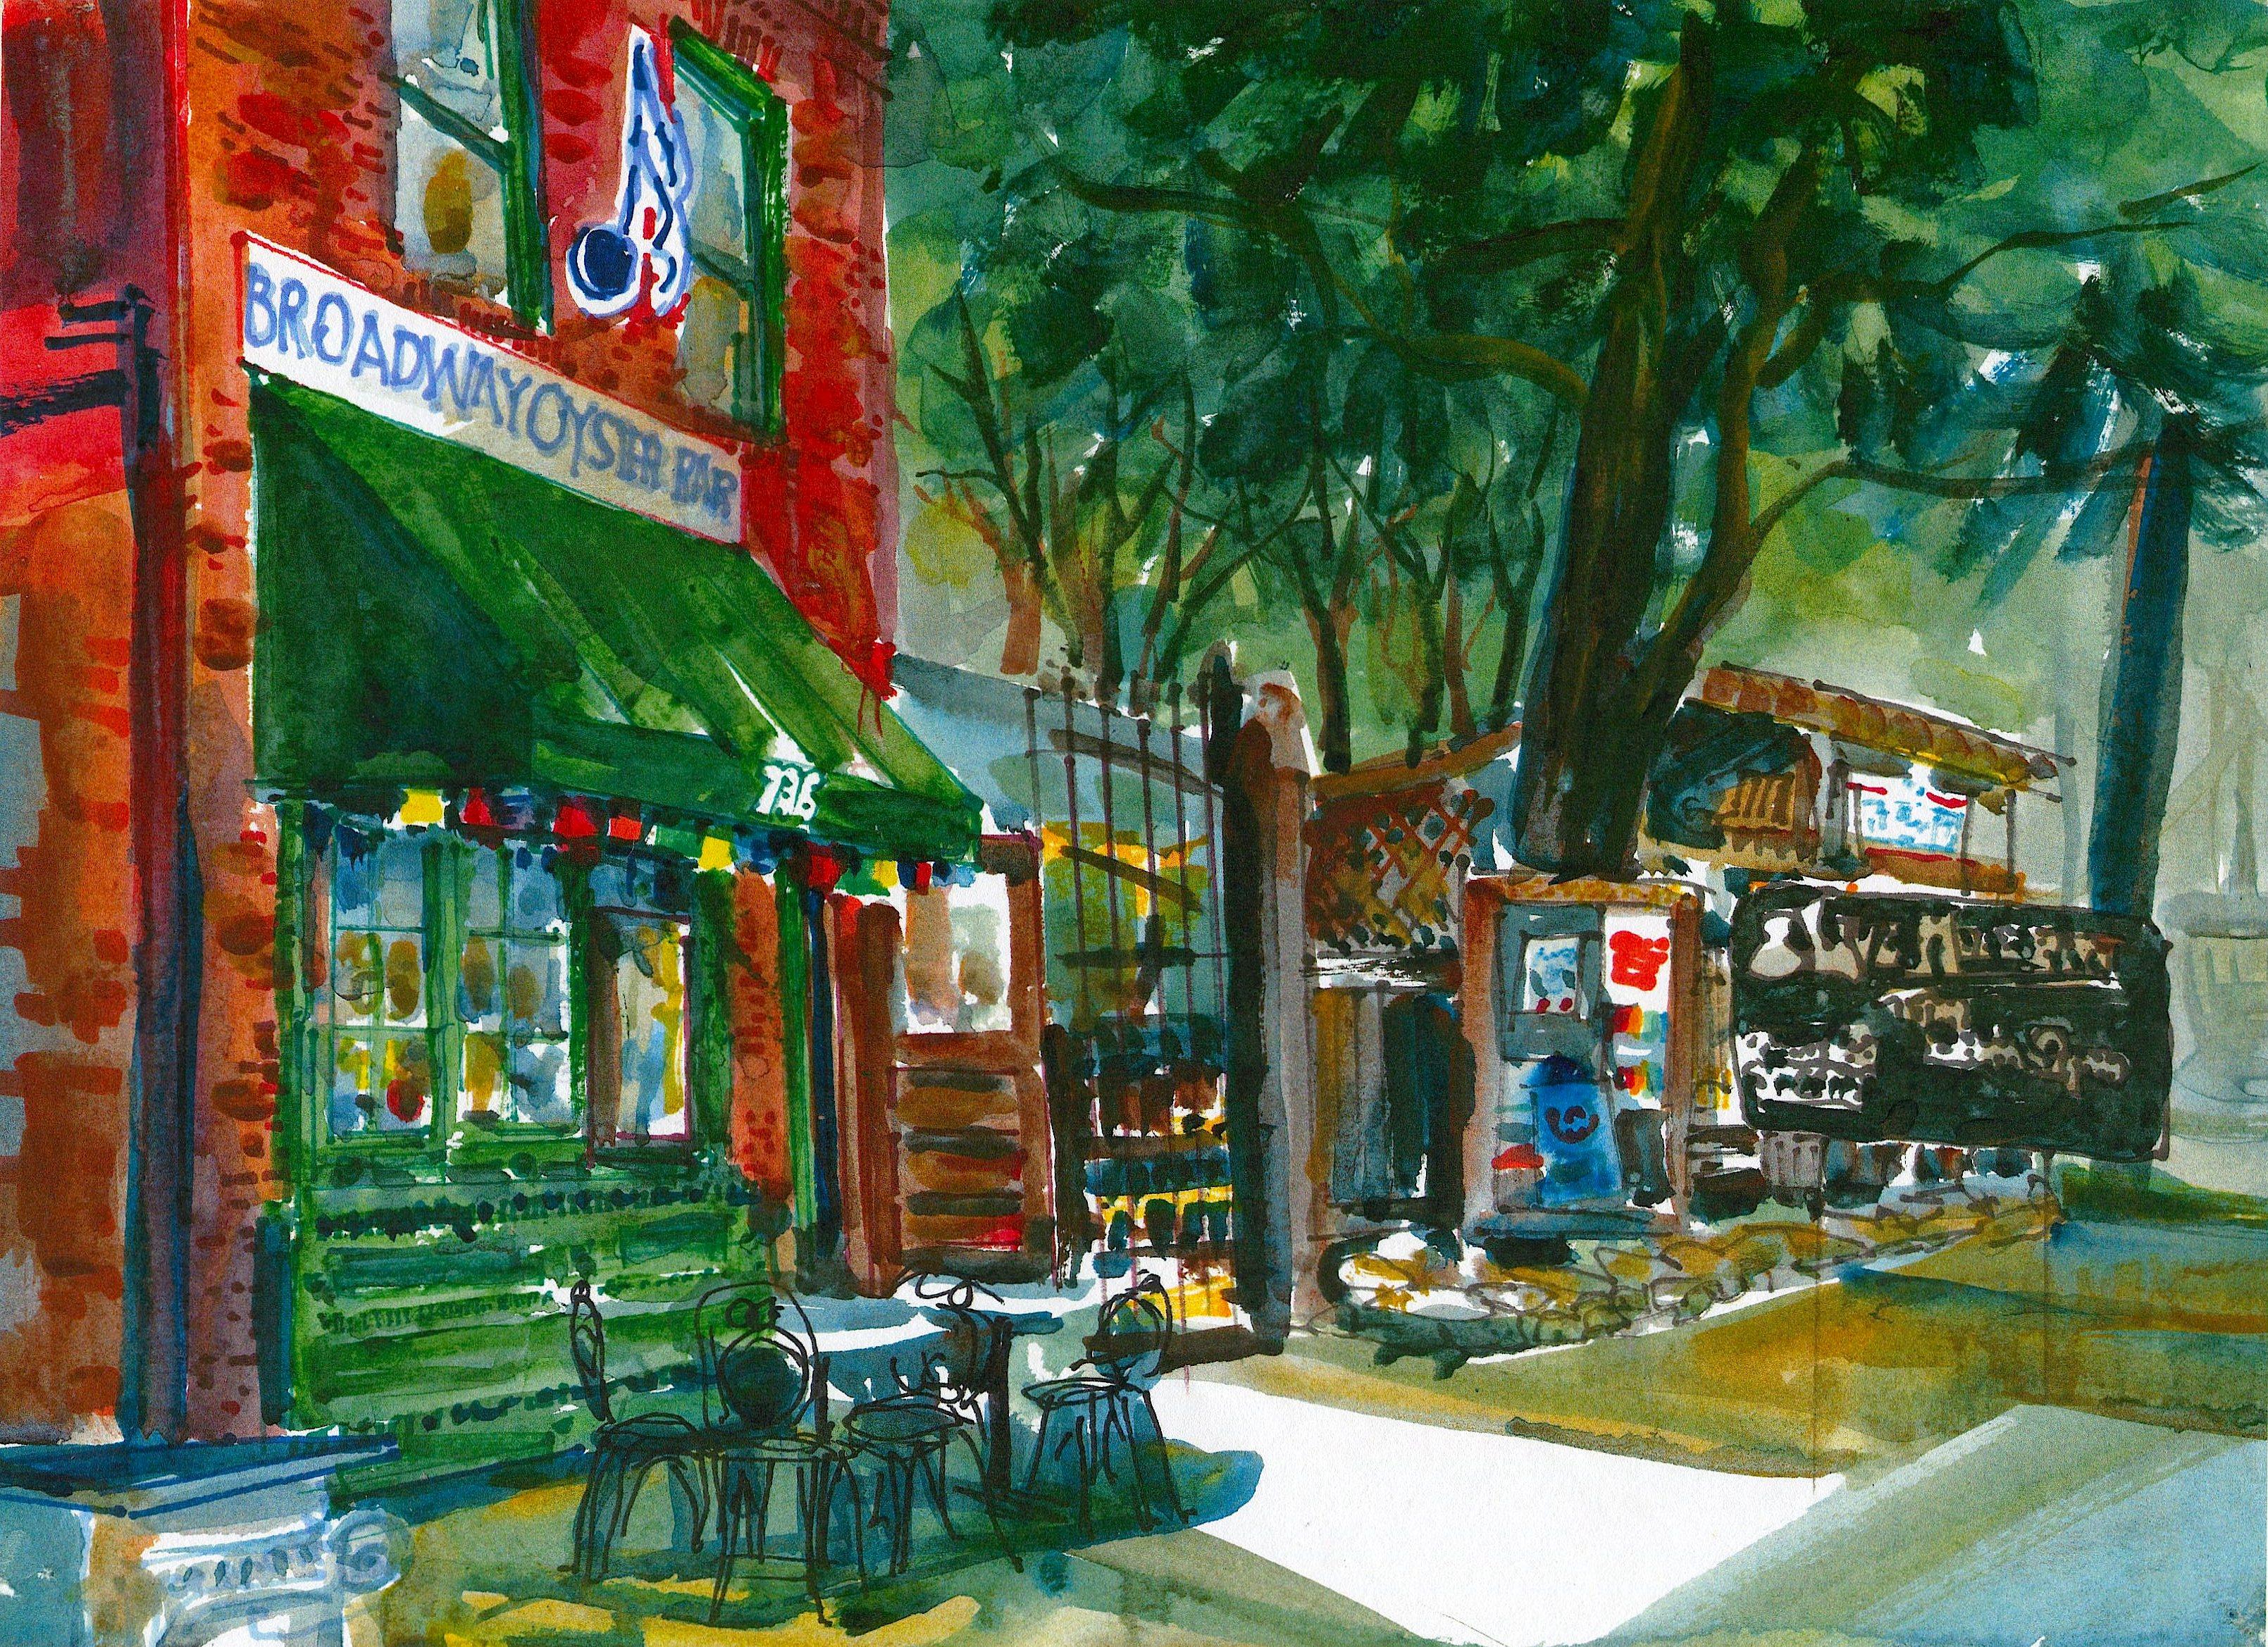 627 Broadway Oyster Bar